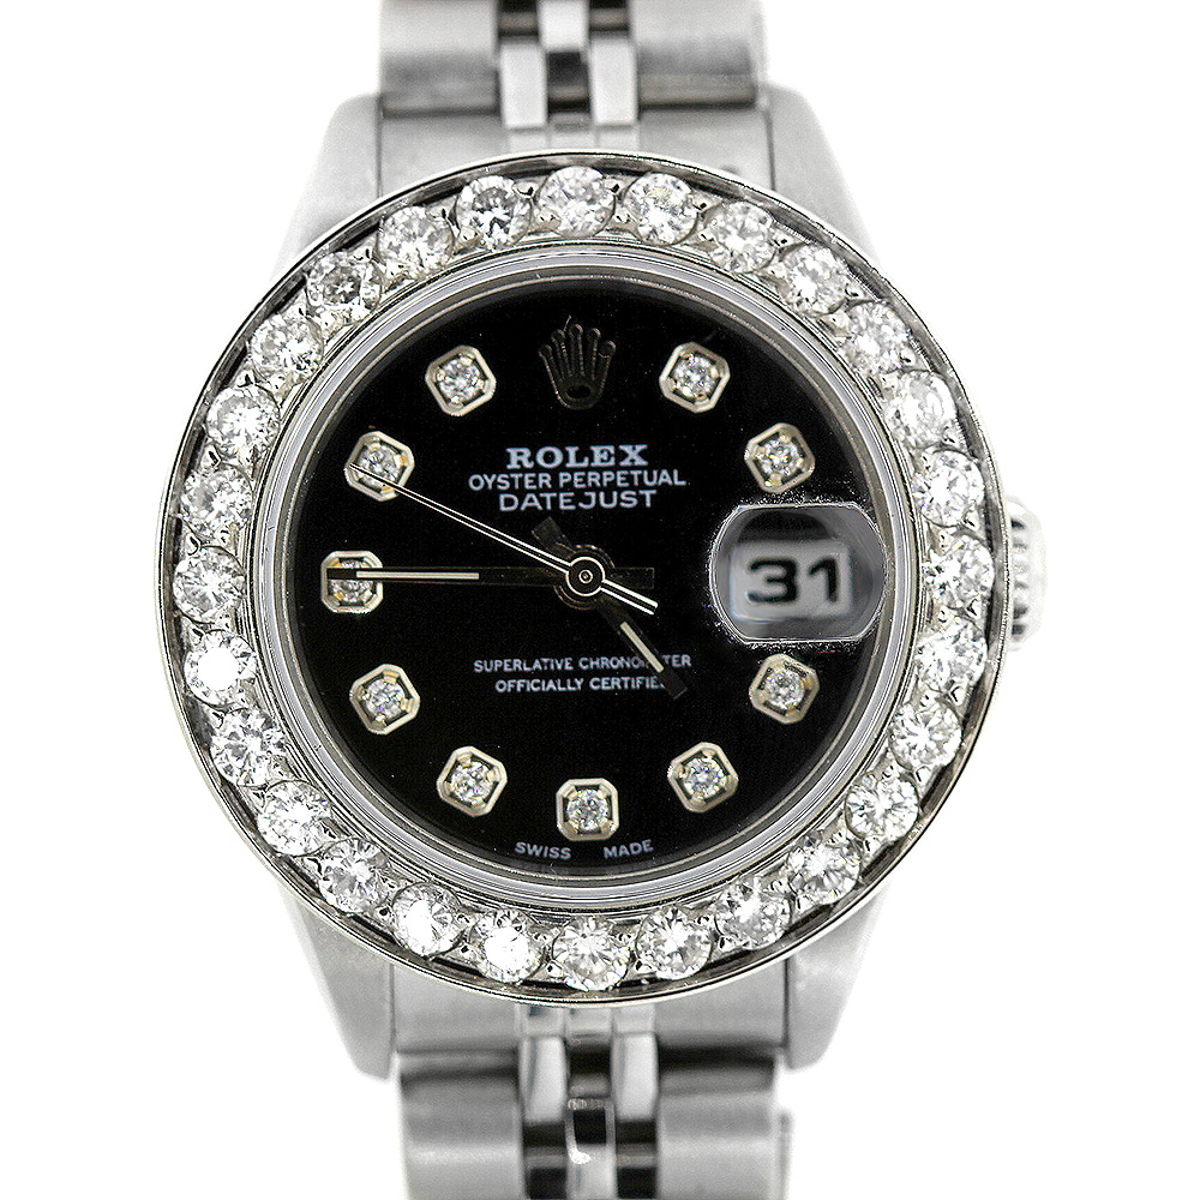 Rolex Datejust Diamond Watch for Women 1.7ct Stainless Steel